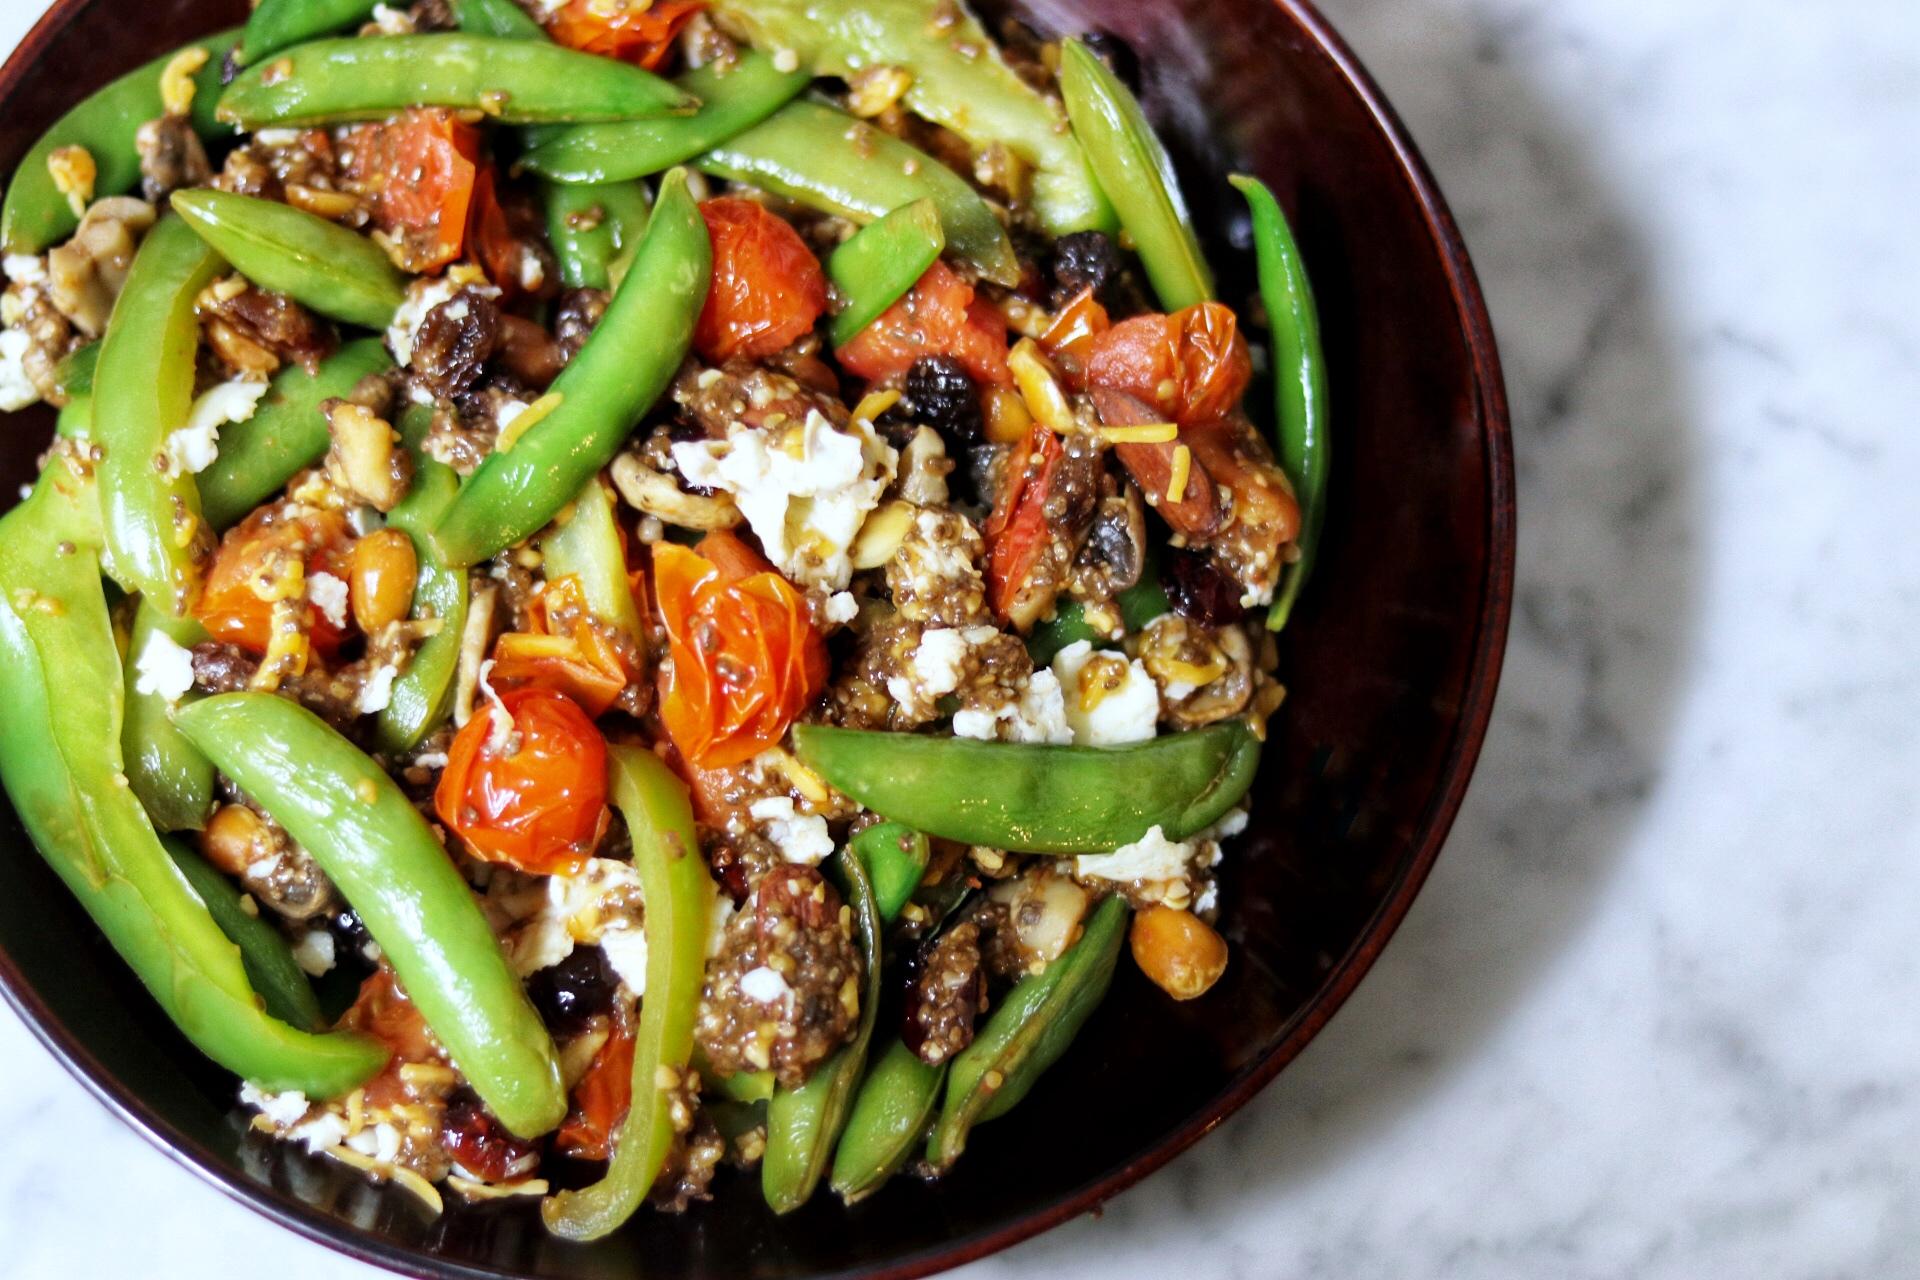 Vegetarian Garden Stir-Fry